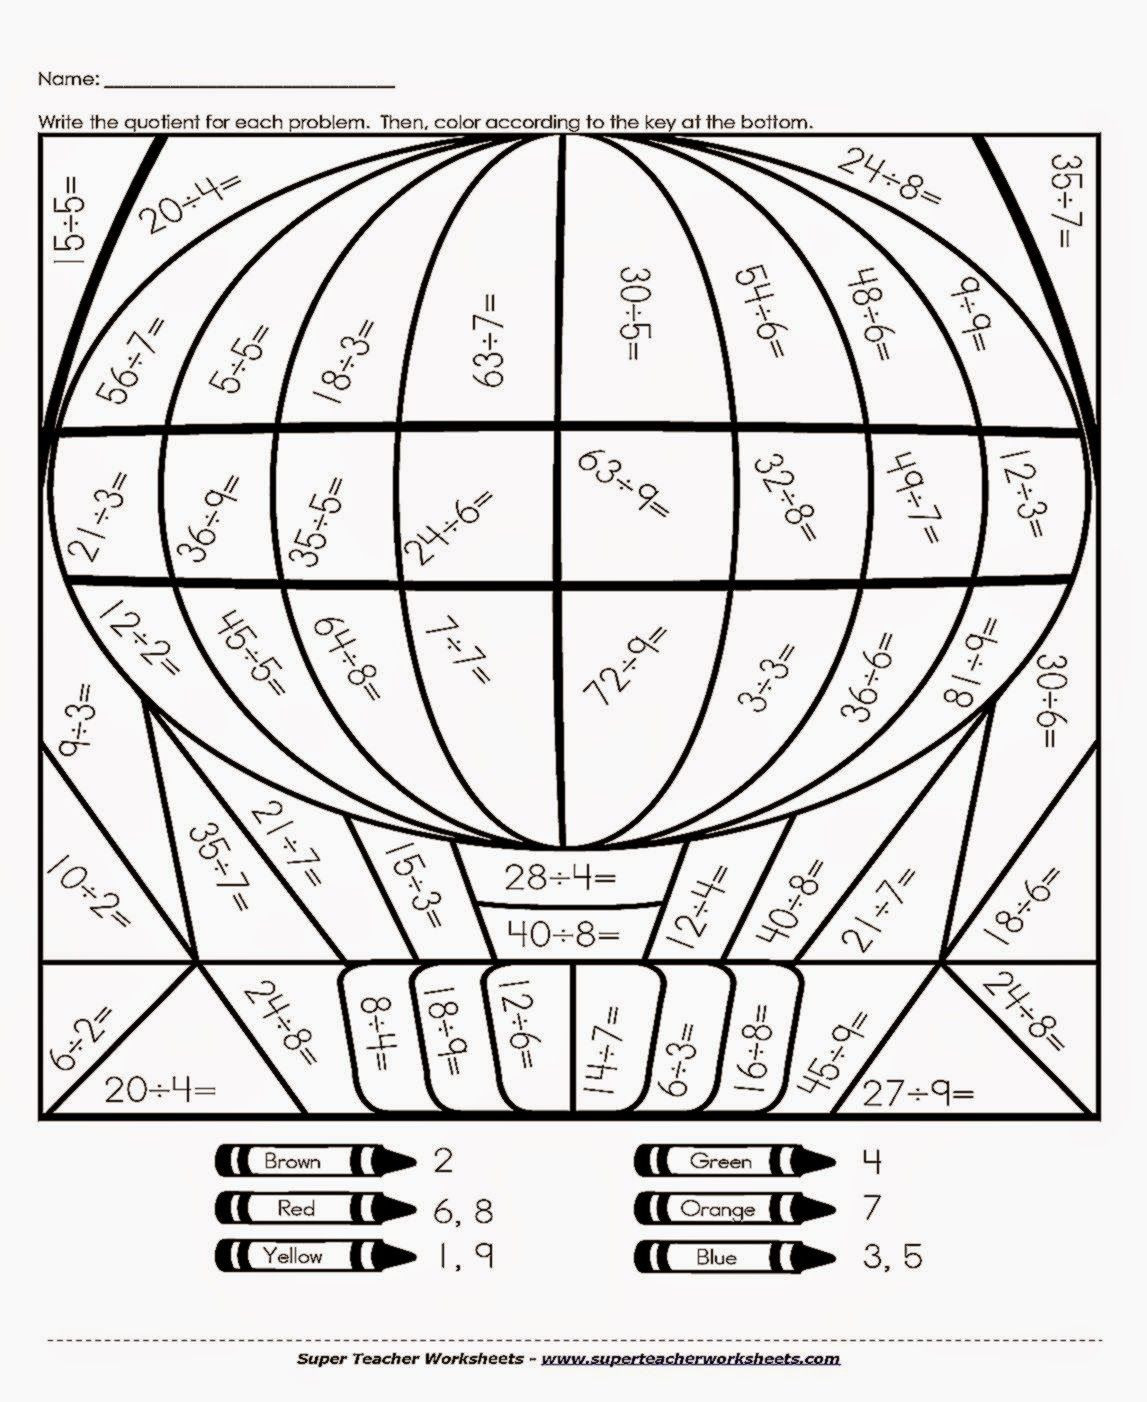 Math Coloring Worksheets 7th Grade Printable Coloring Pages for 7th Graders Th Grade Math